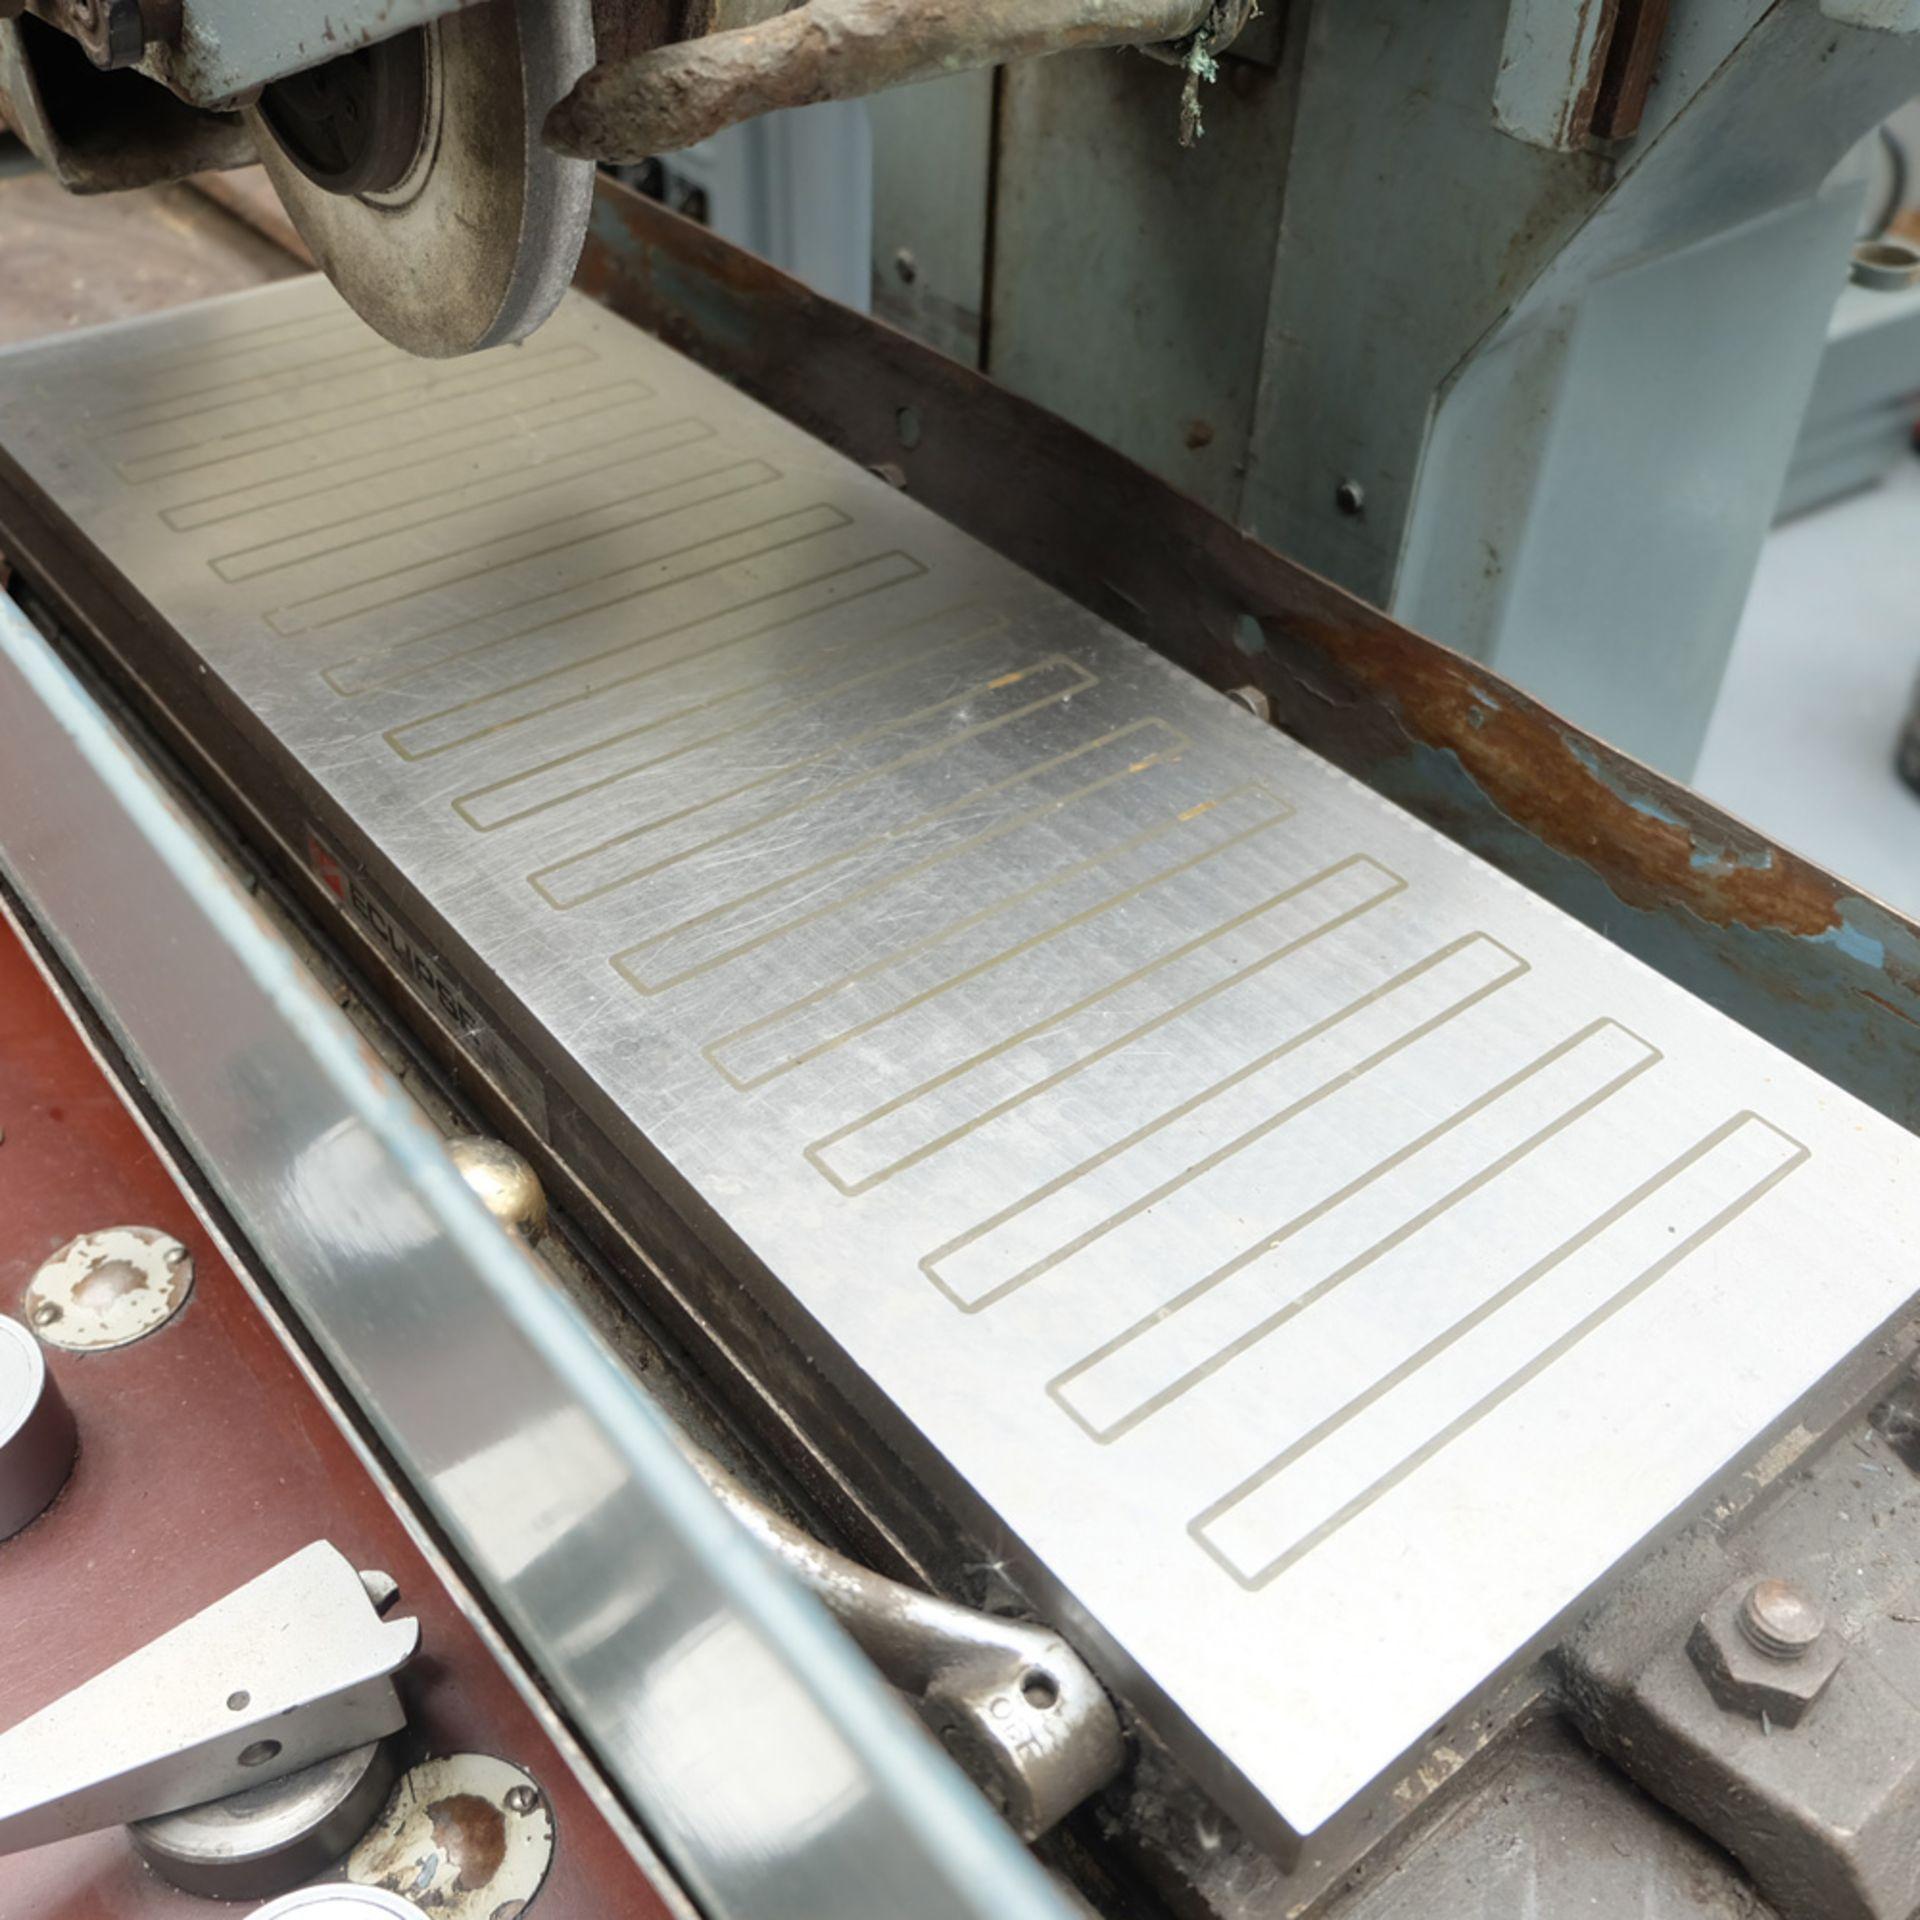 Jones & Shipman 1400P Toolroom Surface Grinder. - Image 7 of 10